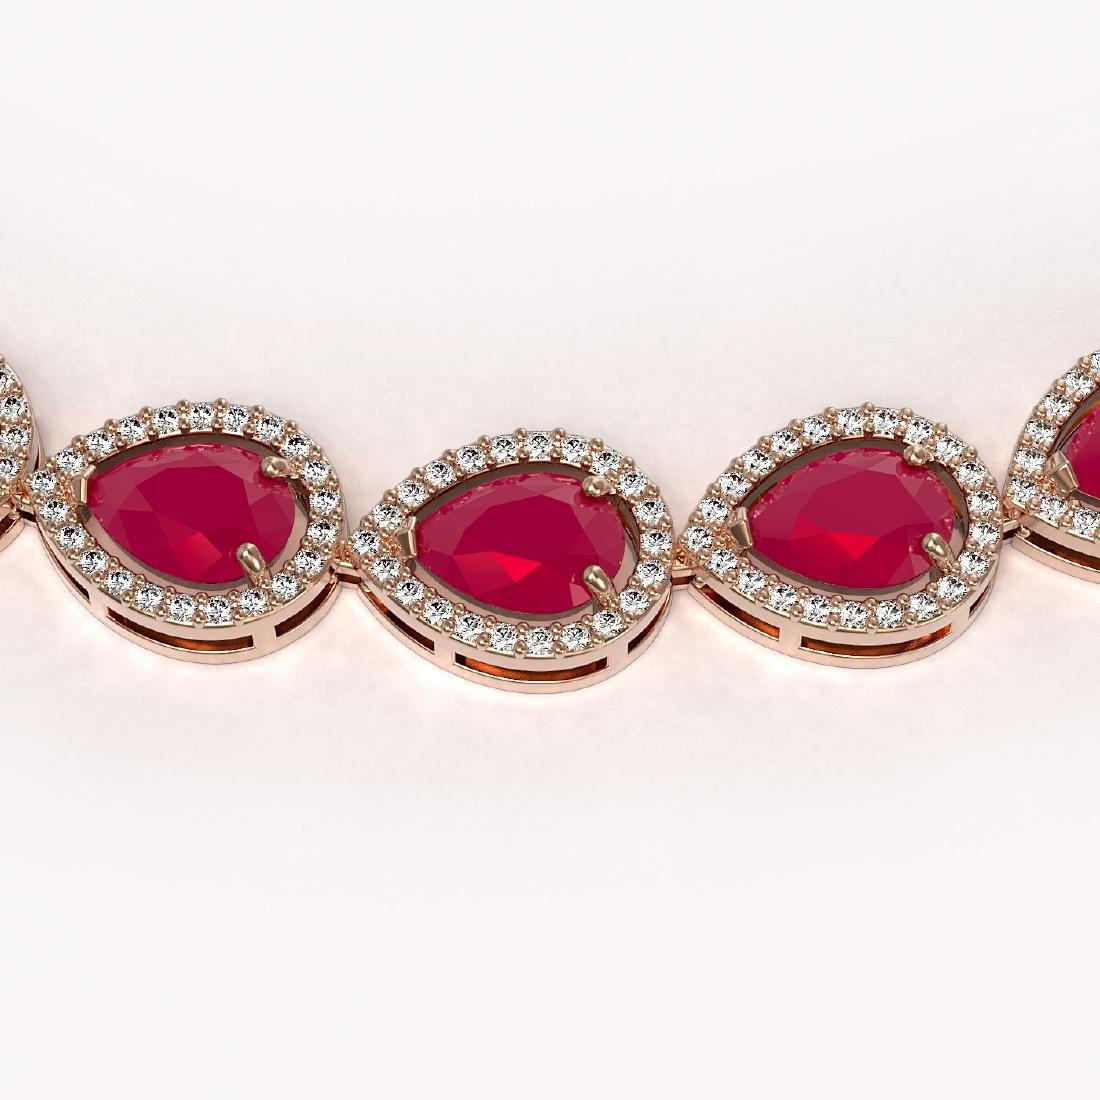 45.93 CTW Ruby & Diamond Halo Necklace 10K Rose Gold - 3